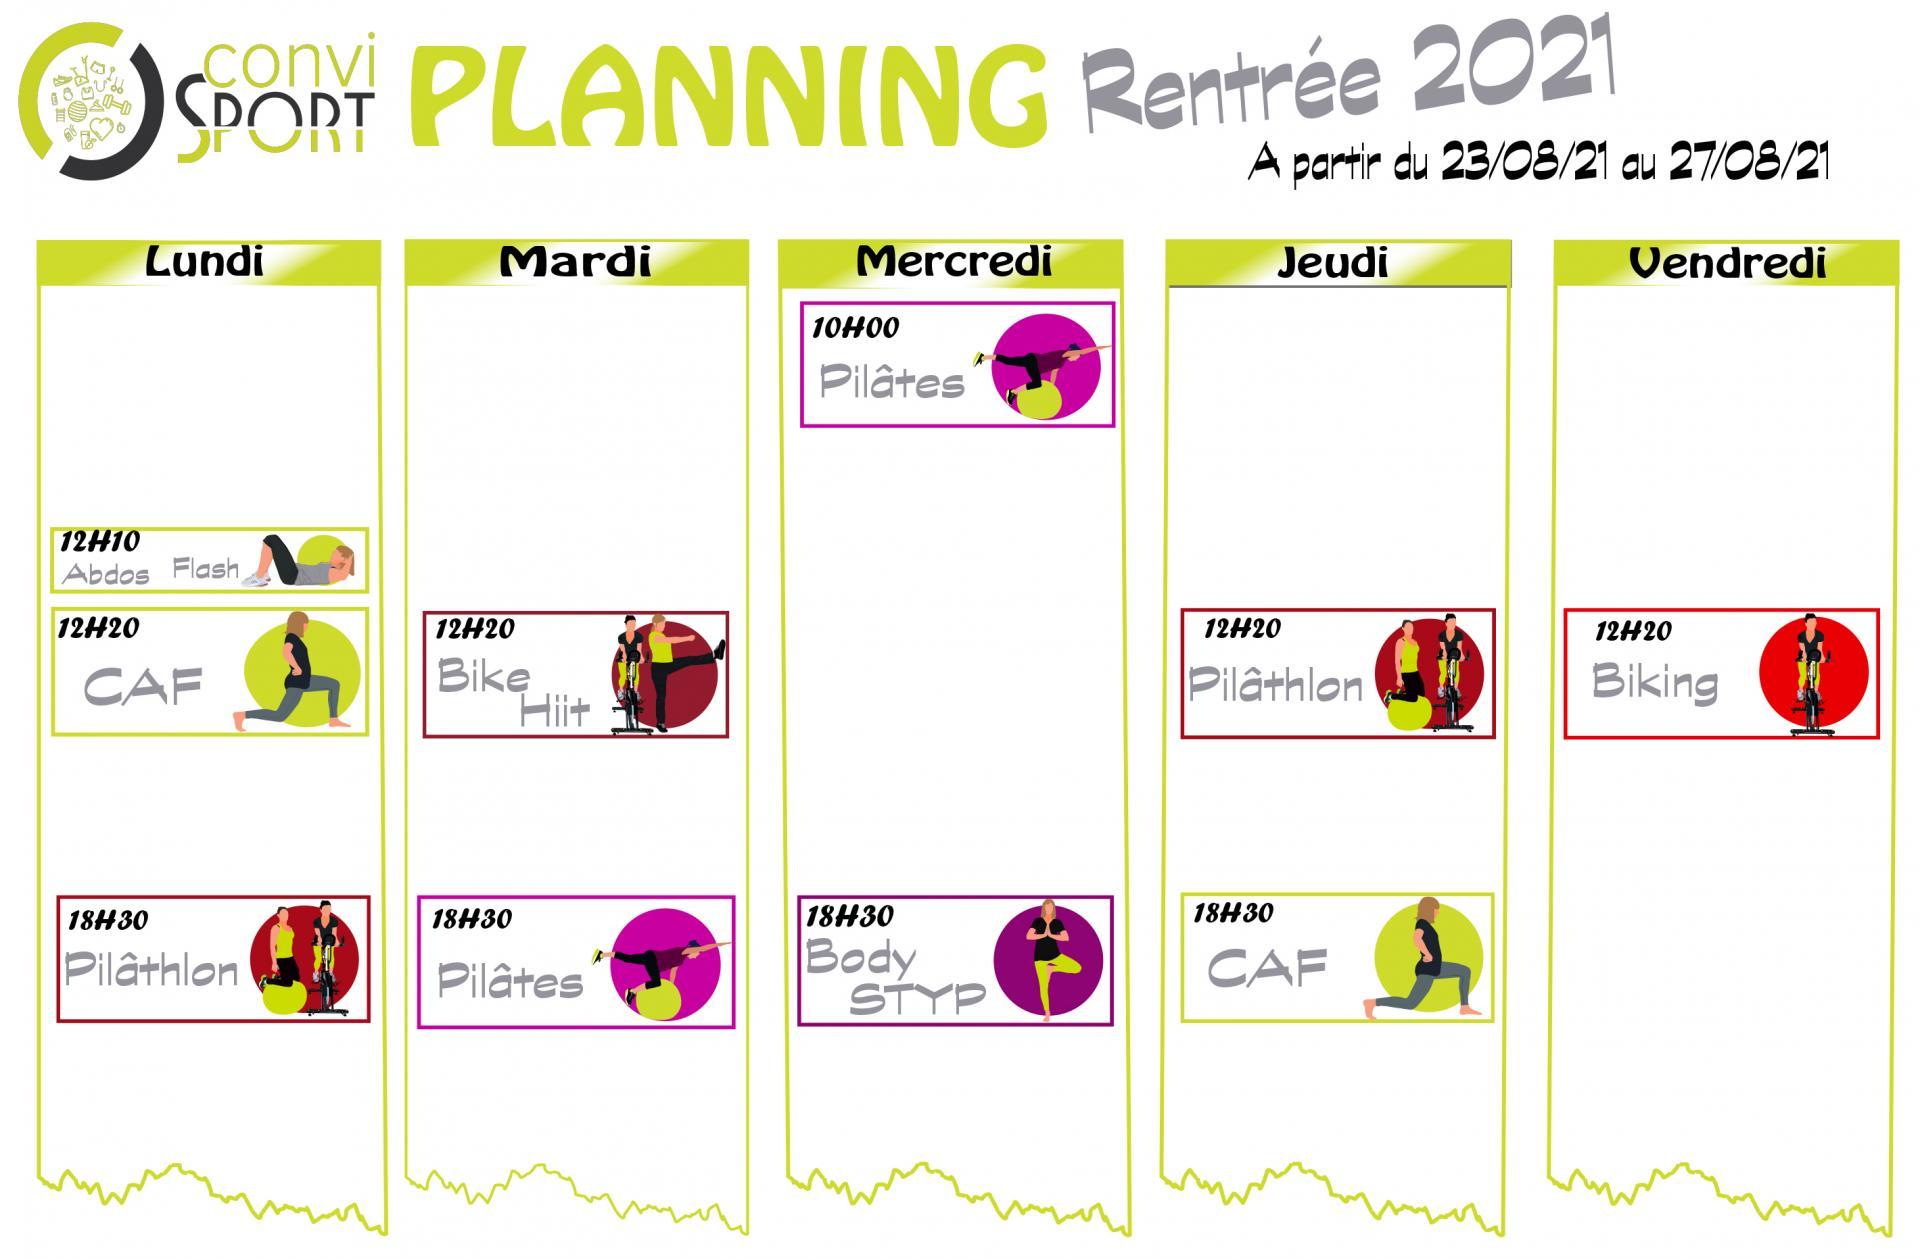 Planning rentree 2021 aout jpeg